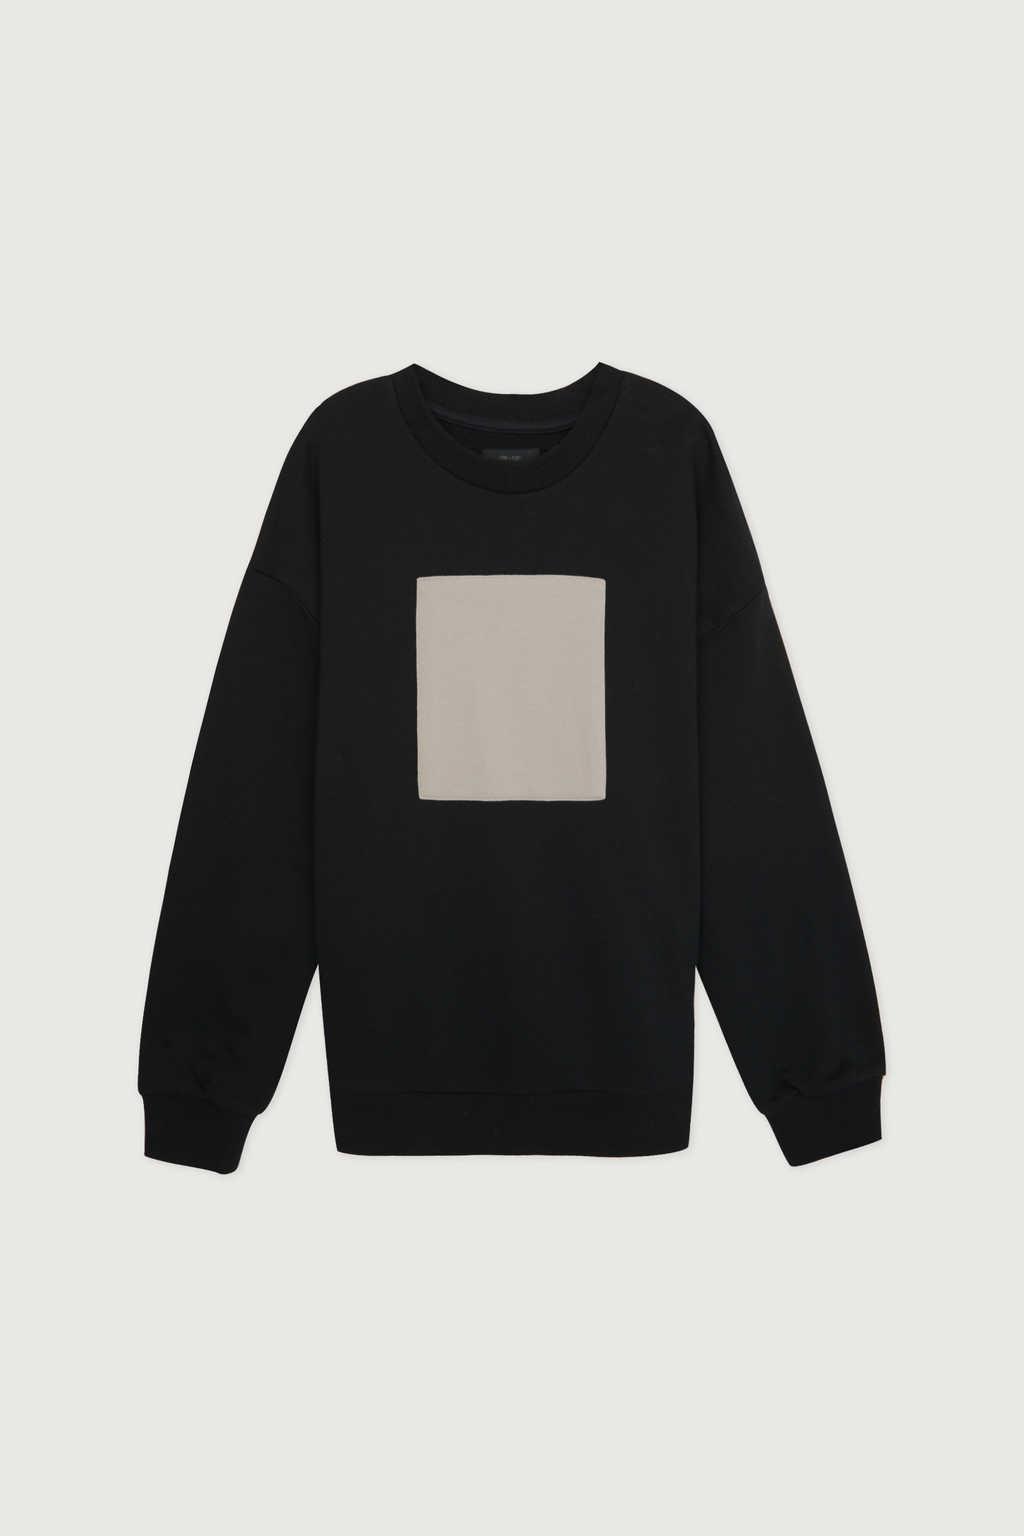 Sweatshirt 3138 Black 17